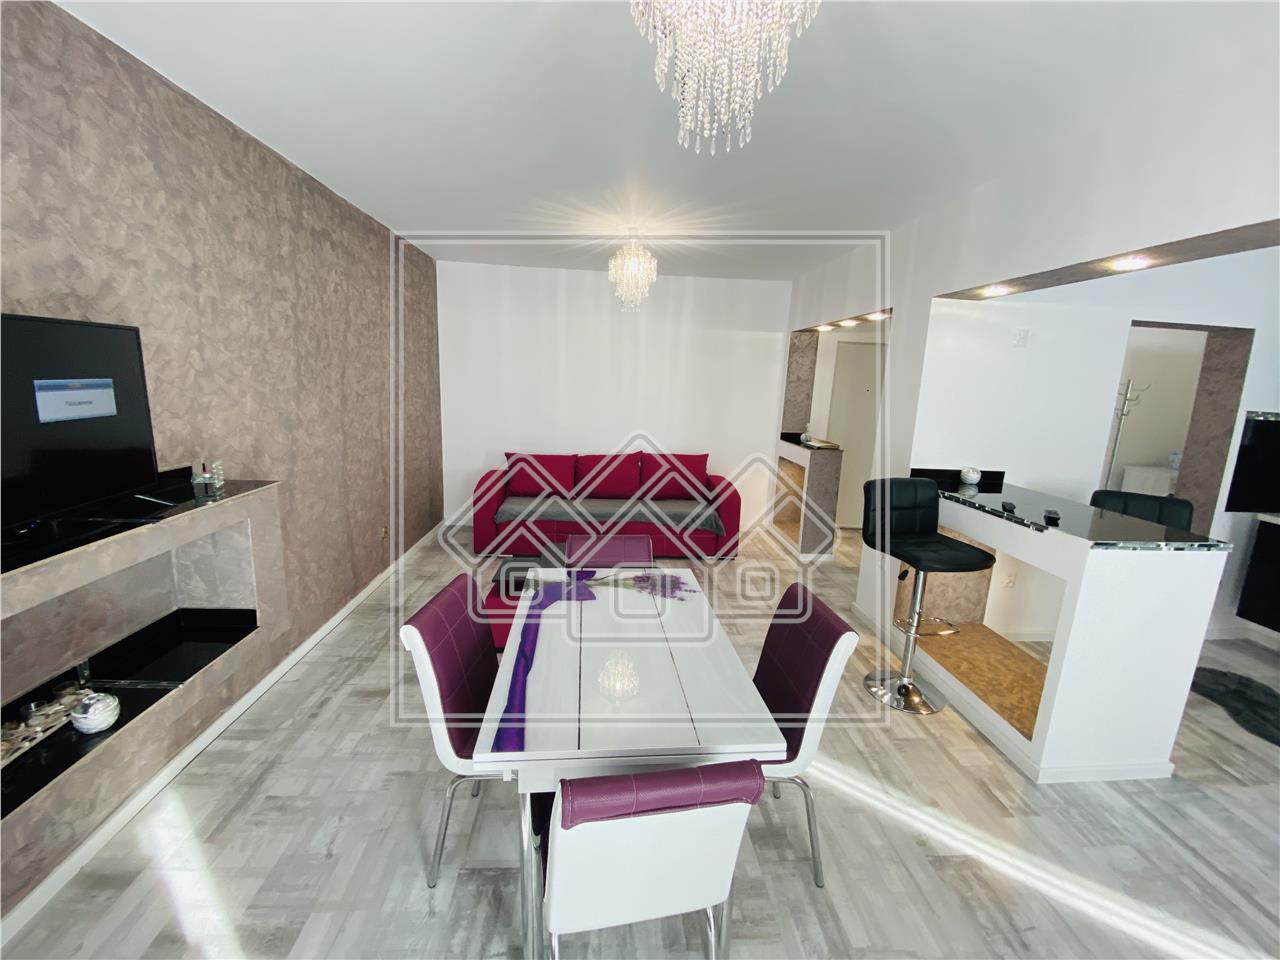 Apartament de vanzare in Sibiu-2 camere cu balcon-Selimbar